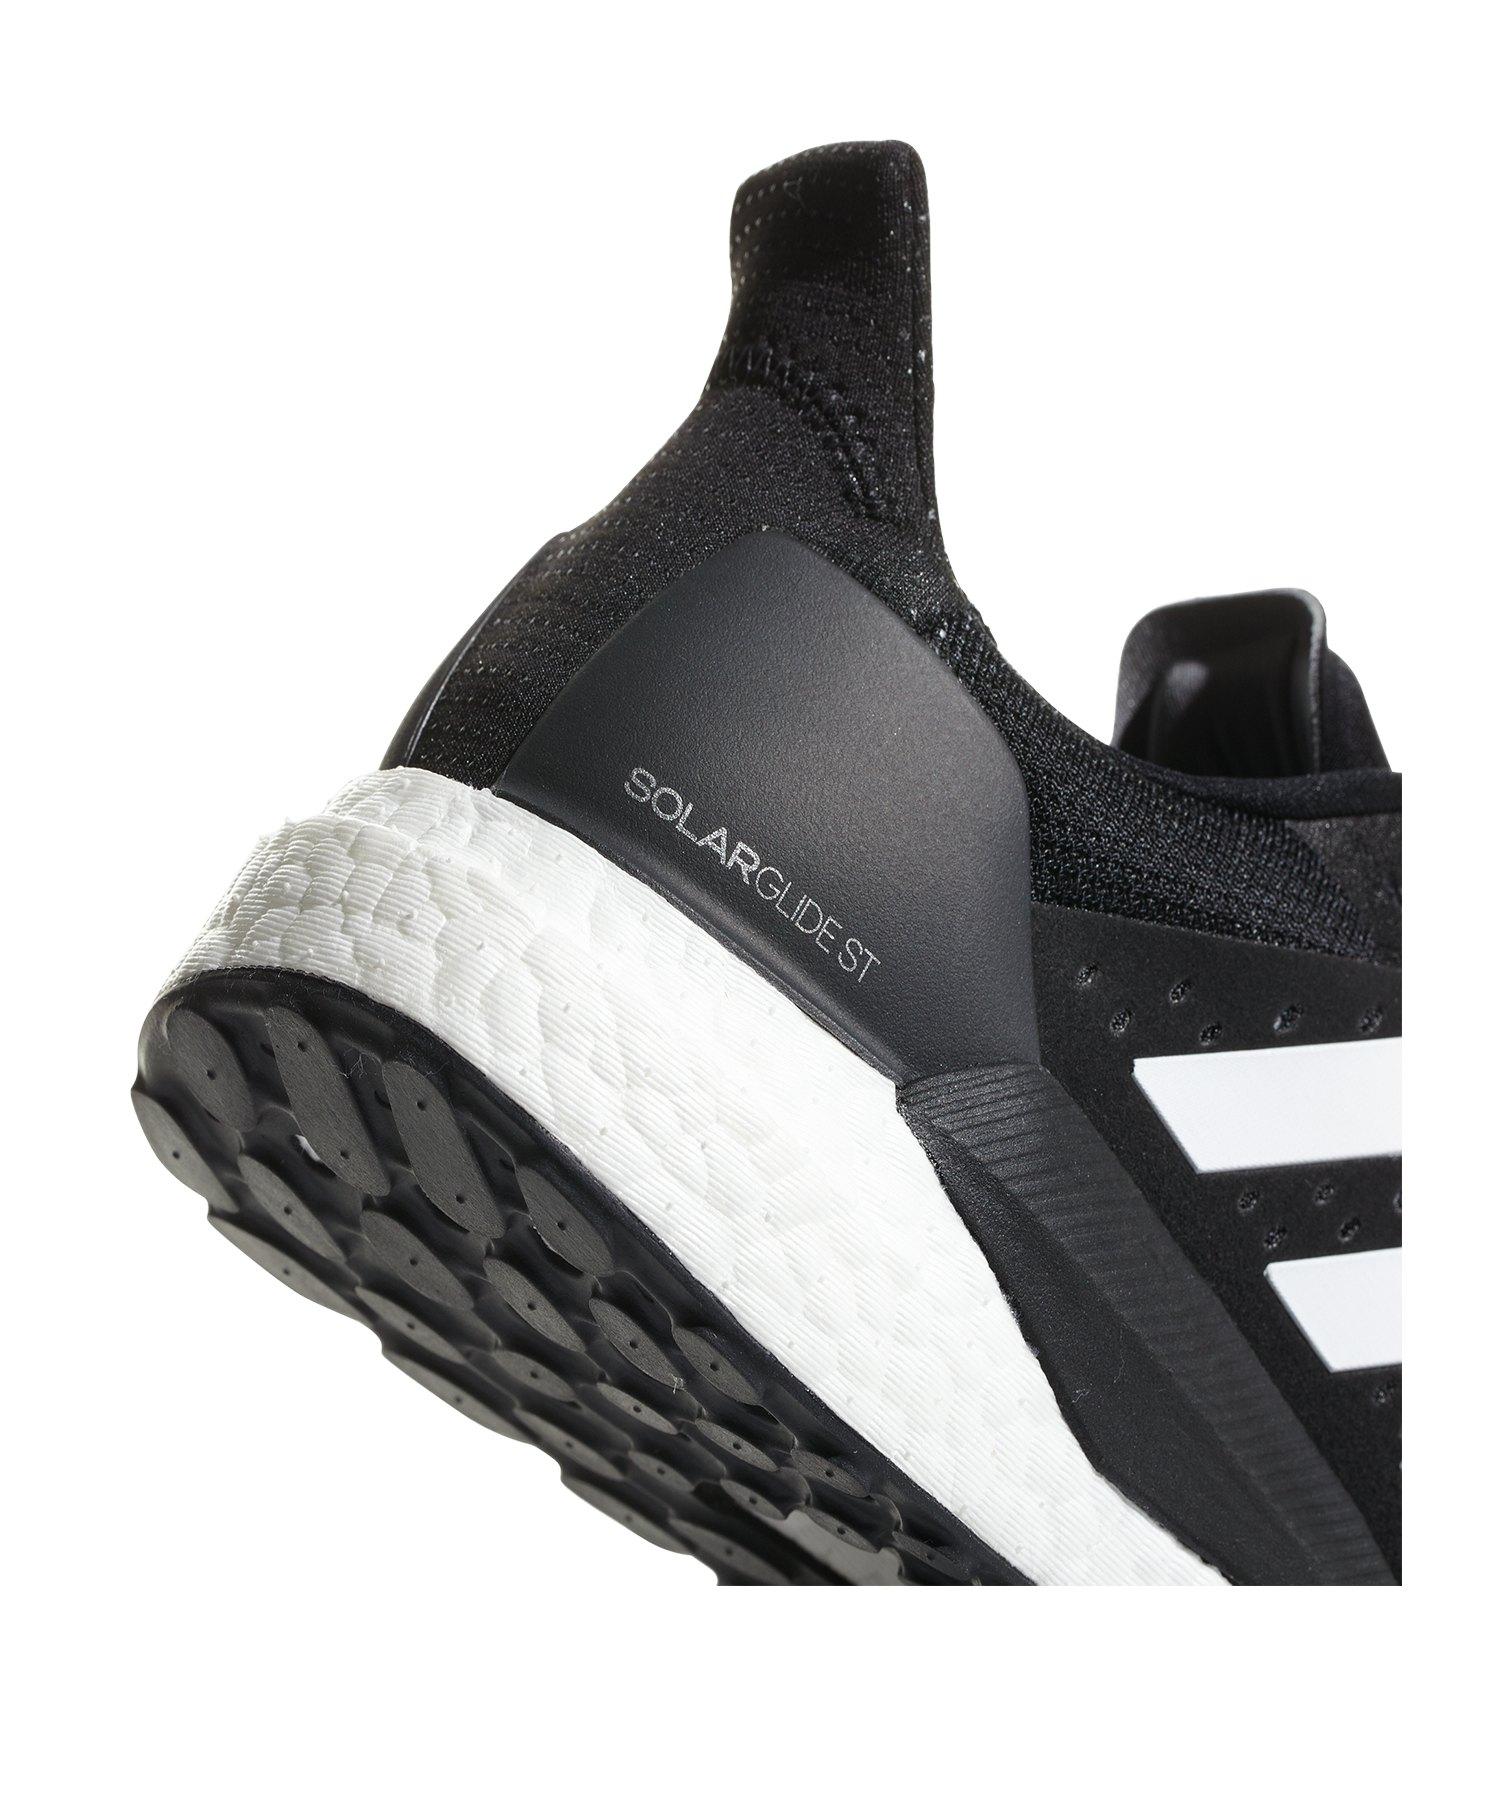 huge selection of 88393 021b9 ... adidas Solar Glide ST Running Schwarz Grau - schwarz ...